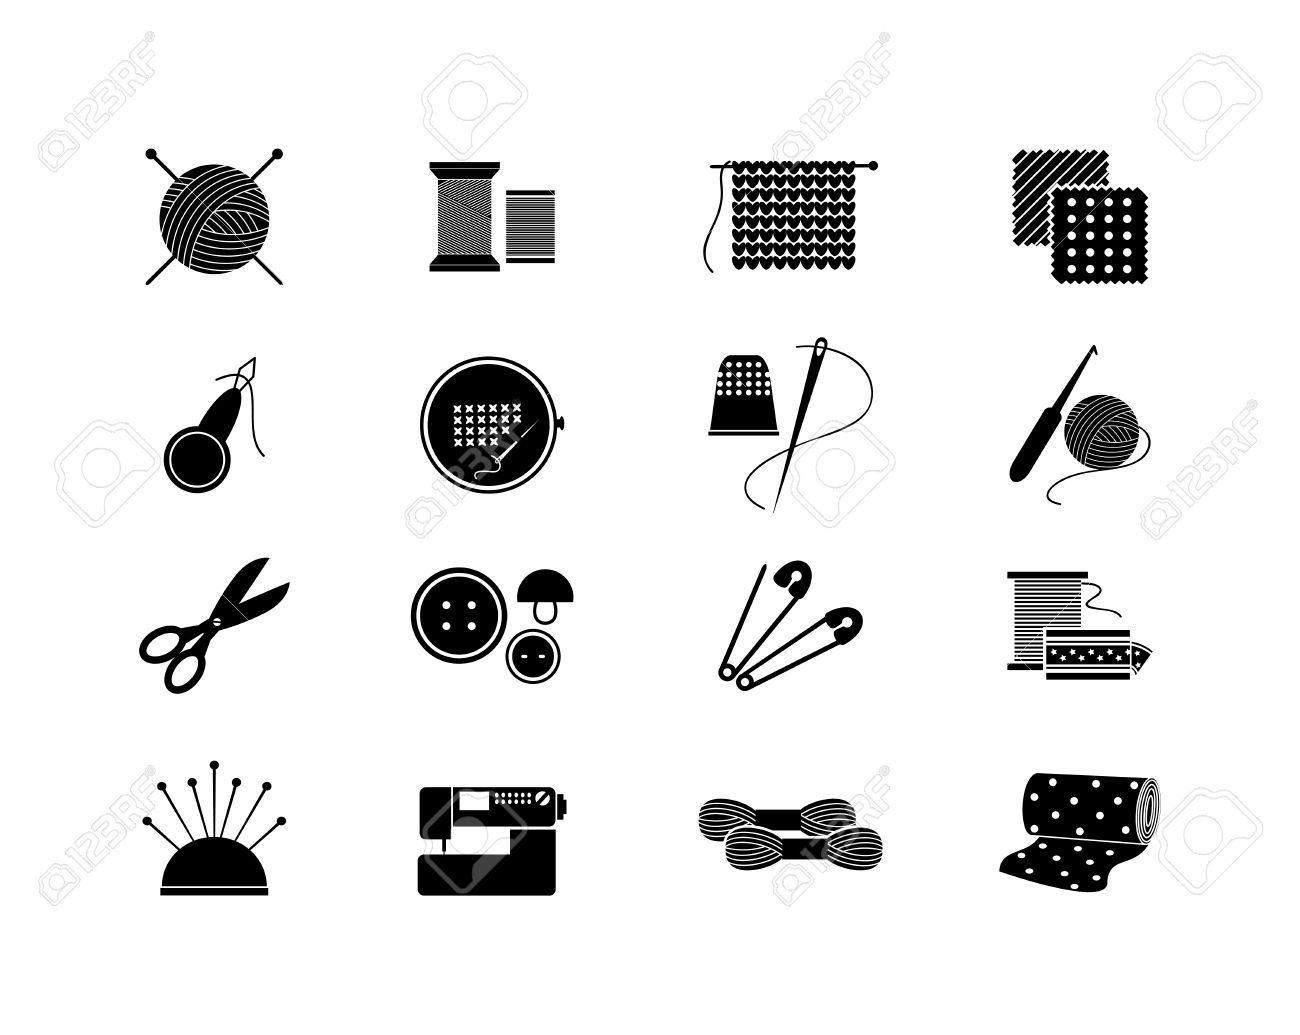 Fantastic Nähmuster Symbole Motif - Decke Stricken Muster ...